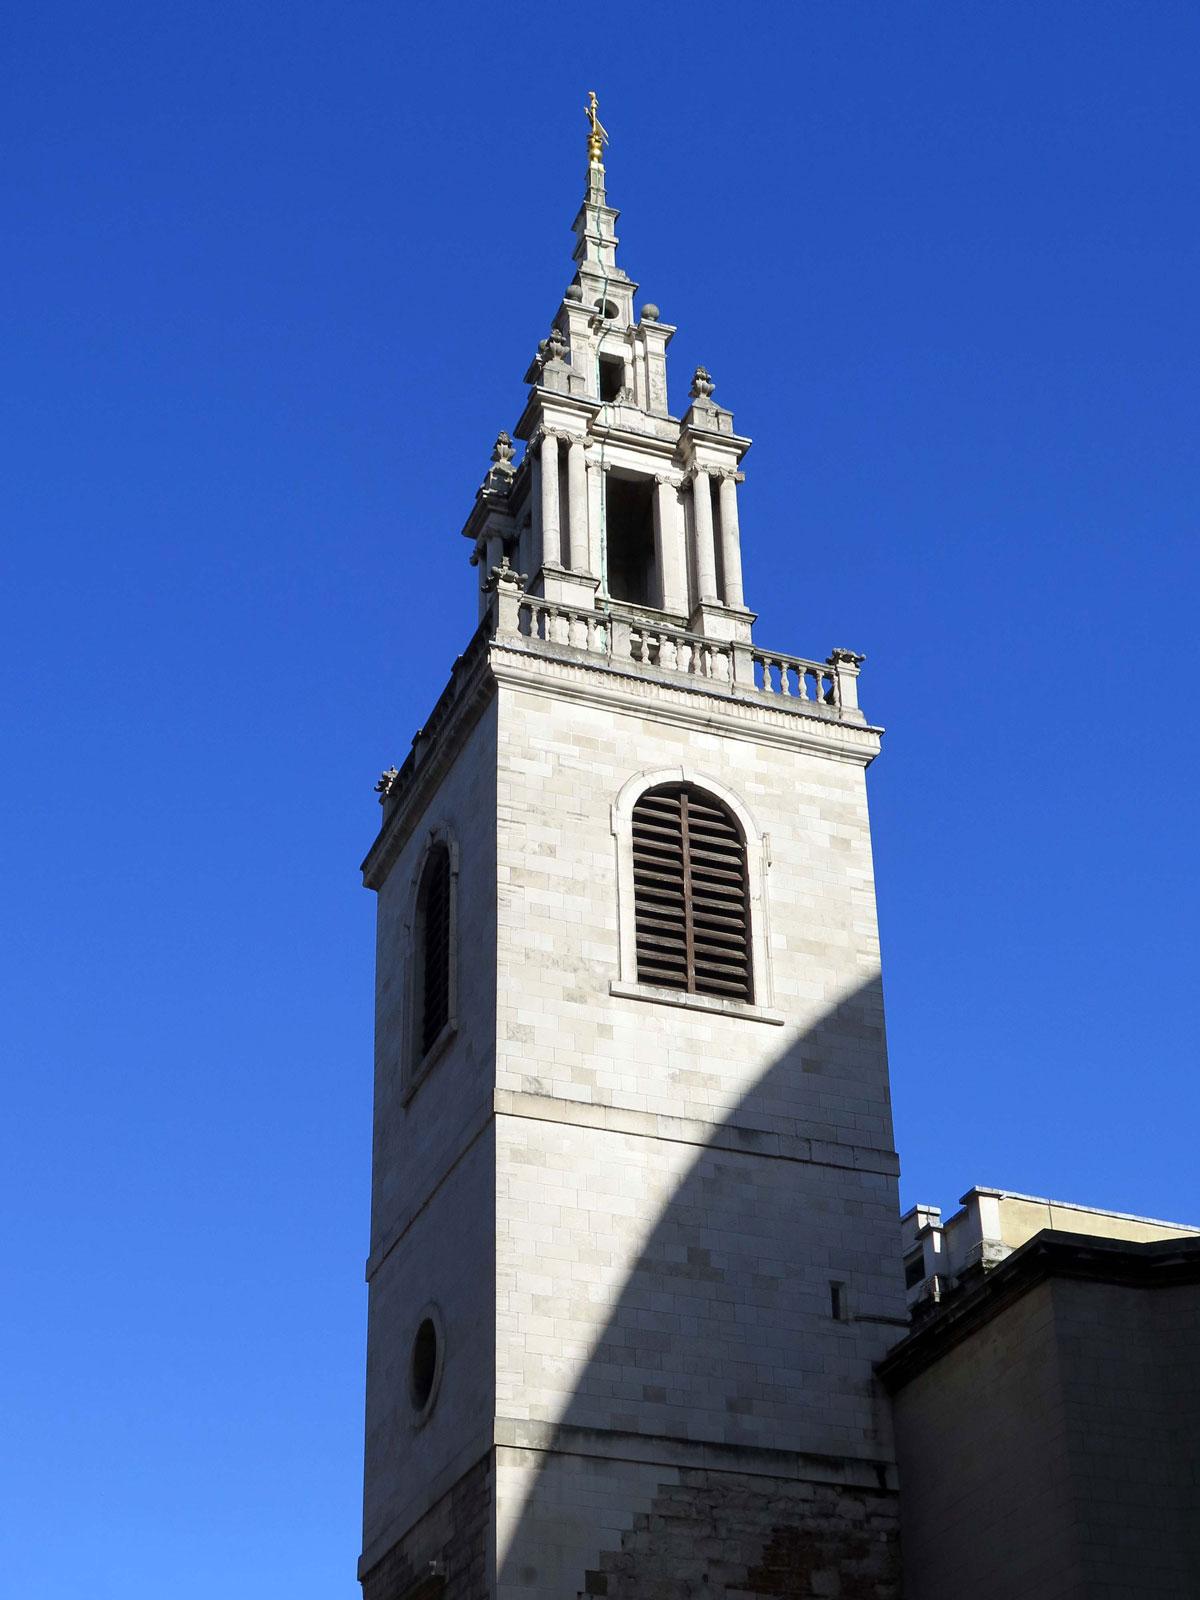 The Lord Mayor's Church